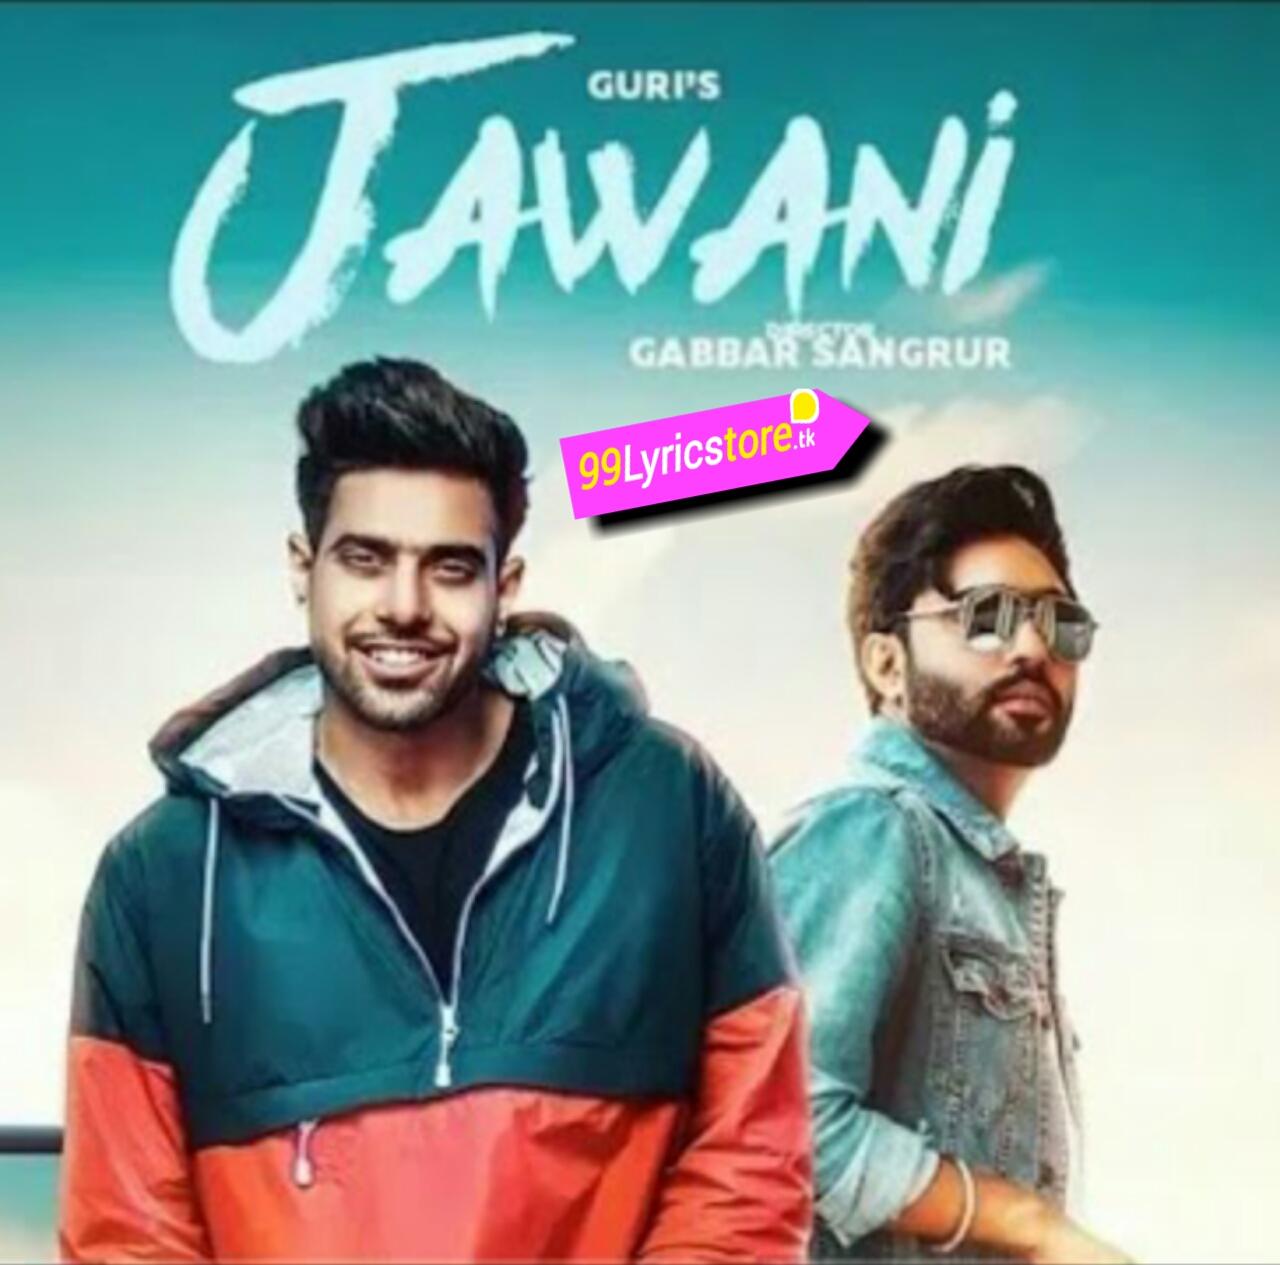 Guri Song Lyrics, Deep jandhu Song Lyrics, Latest Punjabi Song Lyrics